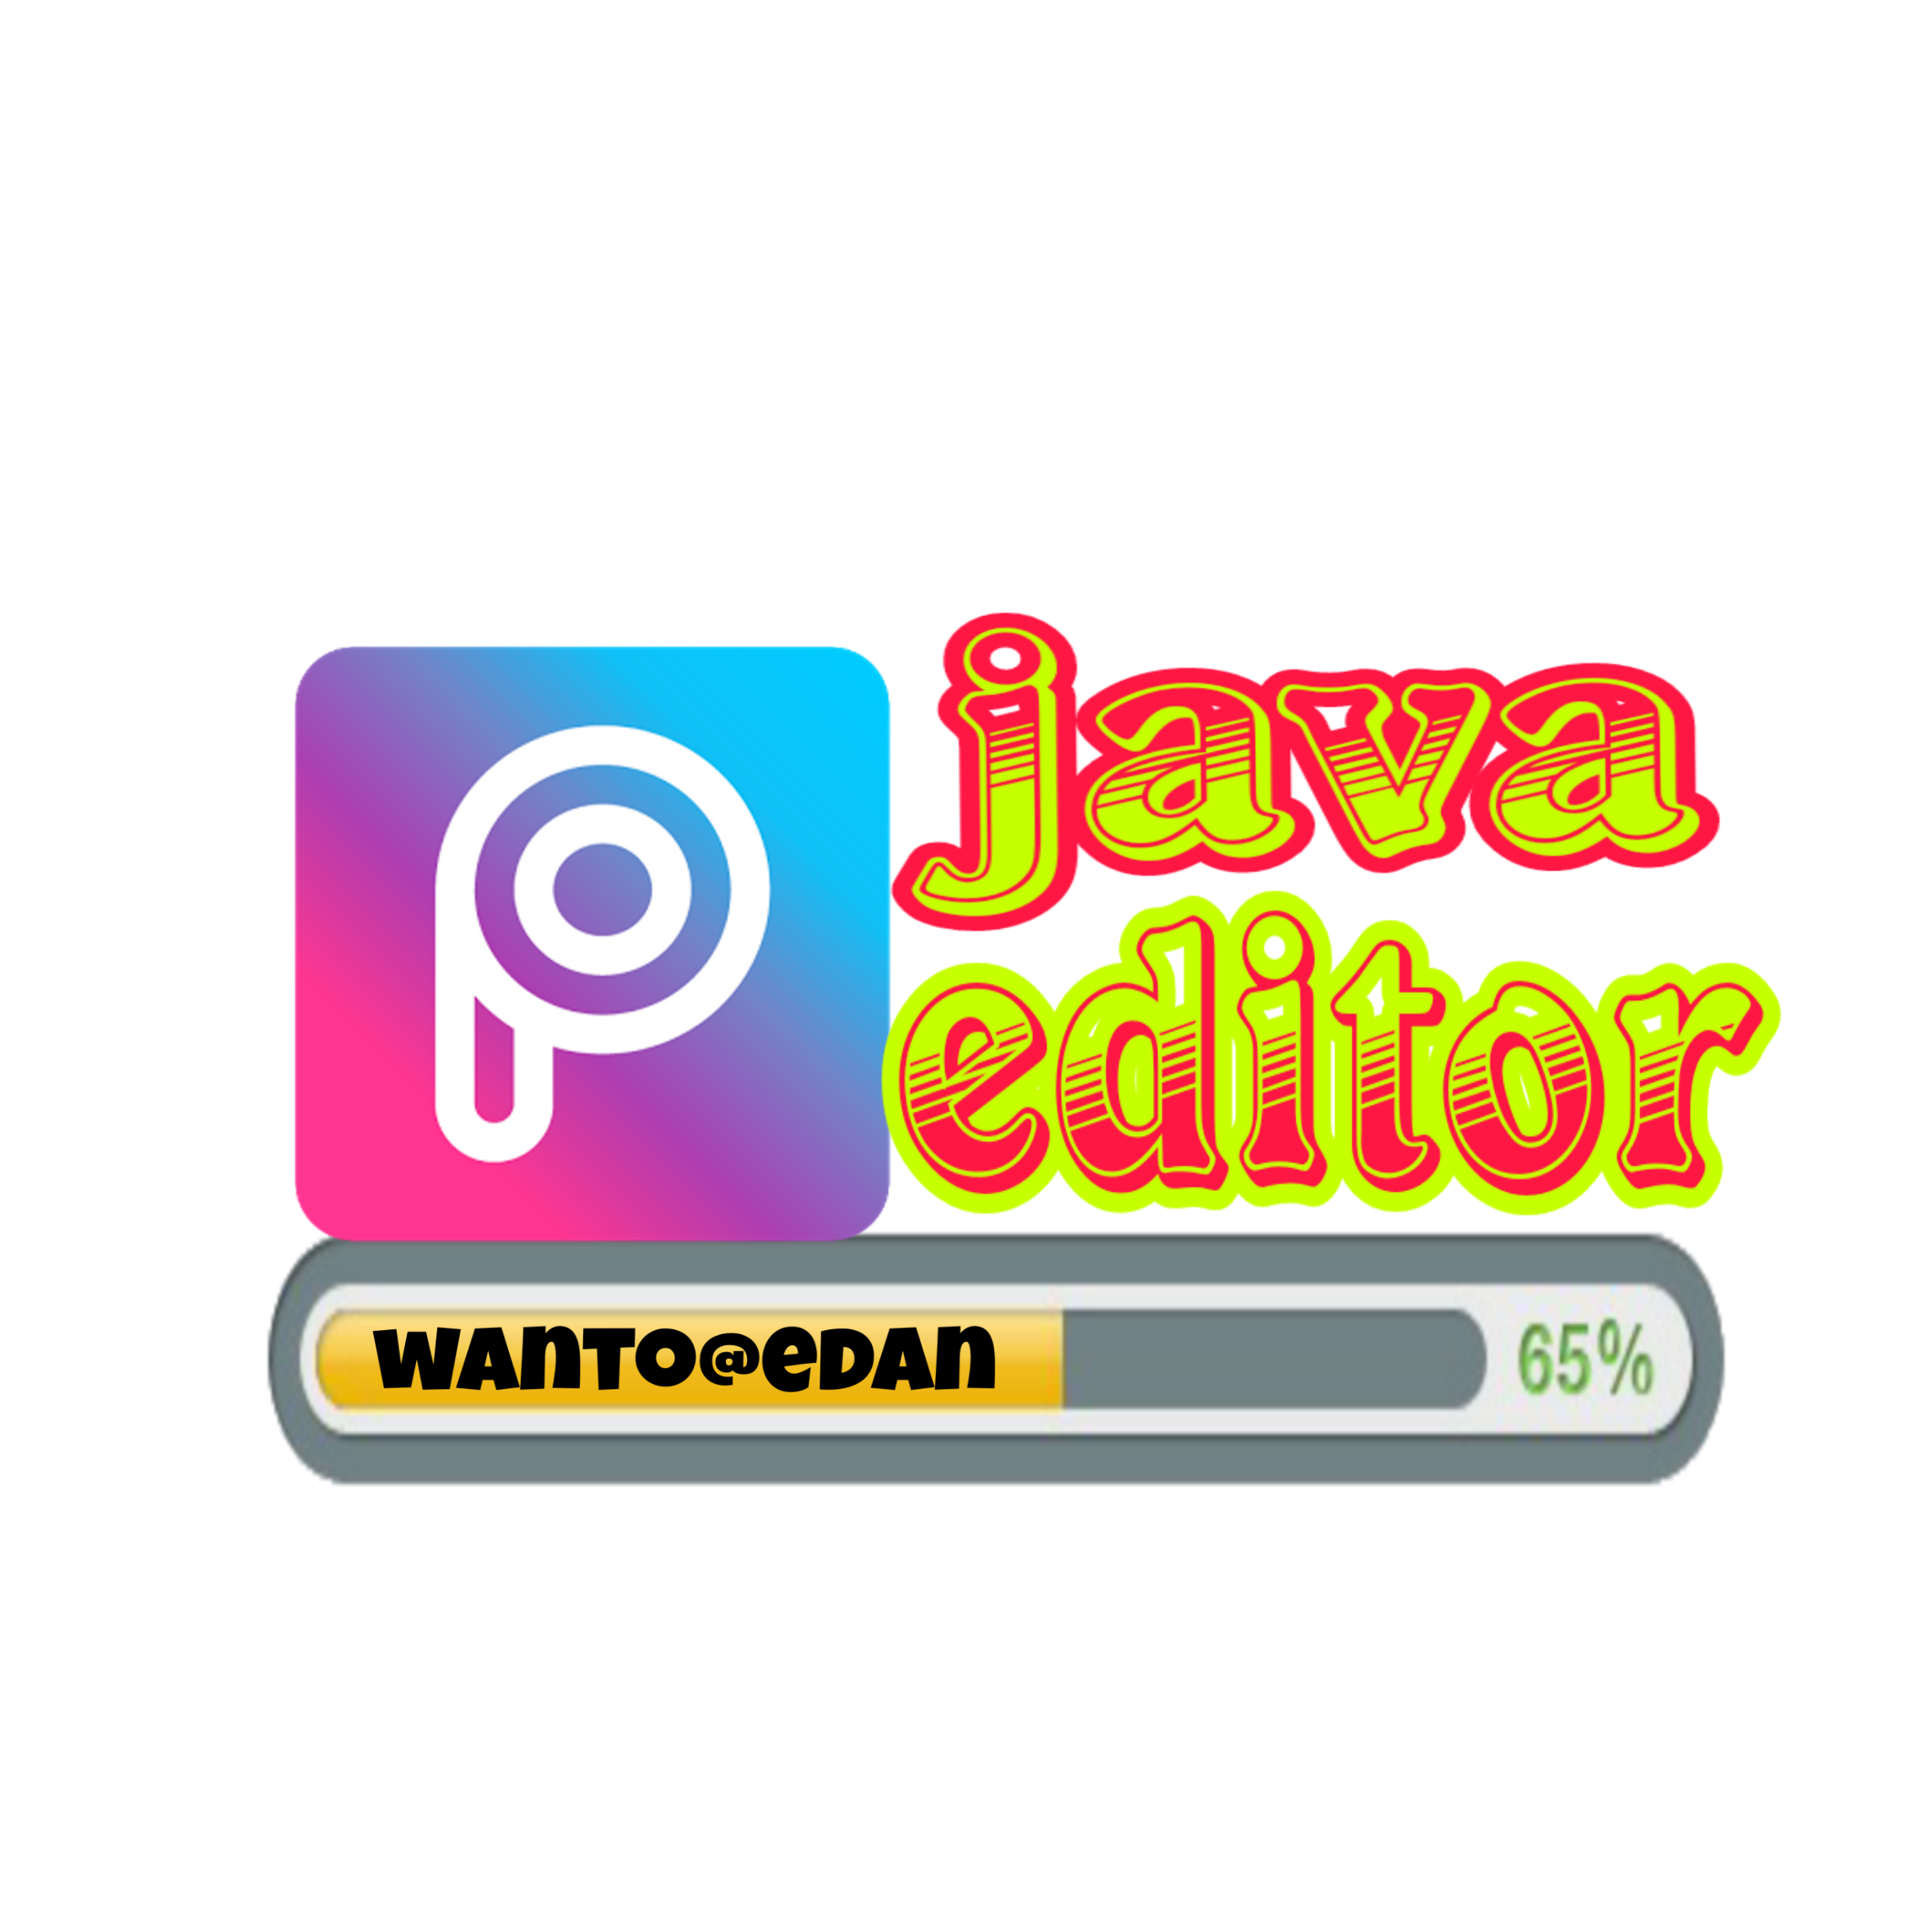 java editor - Sticker by Tris Wanto